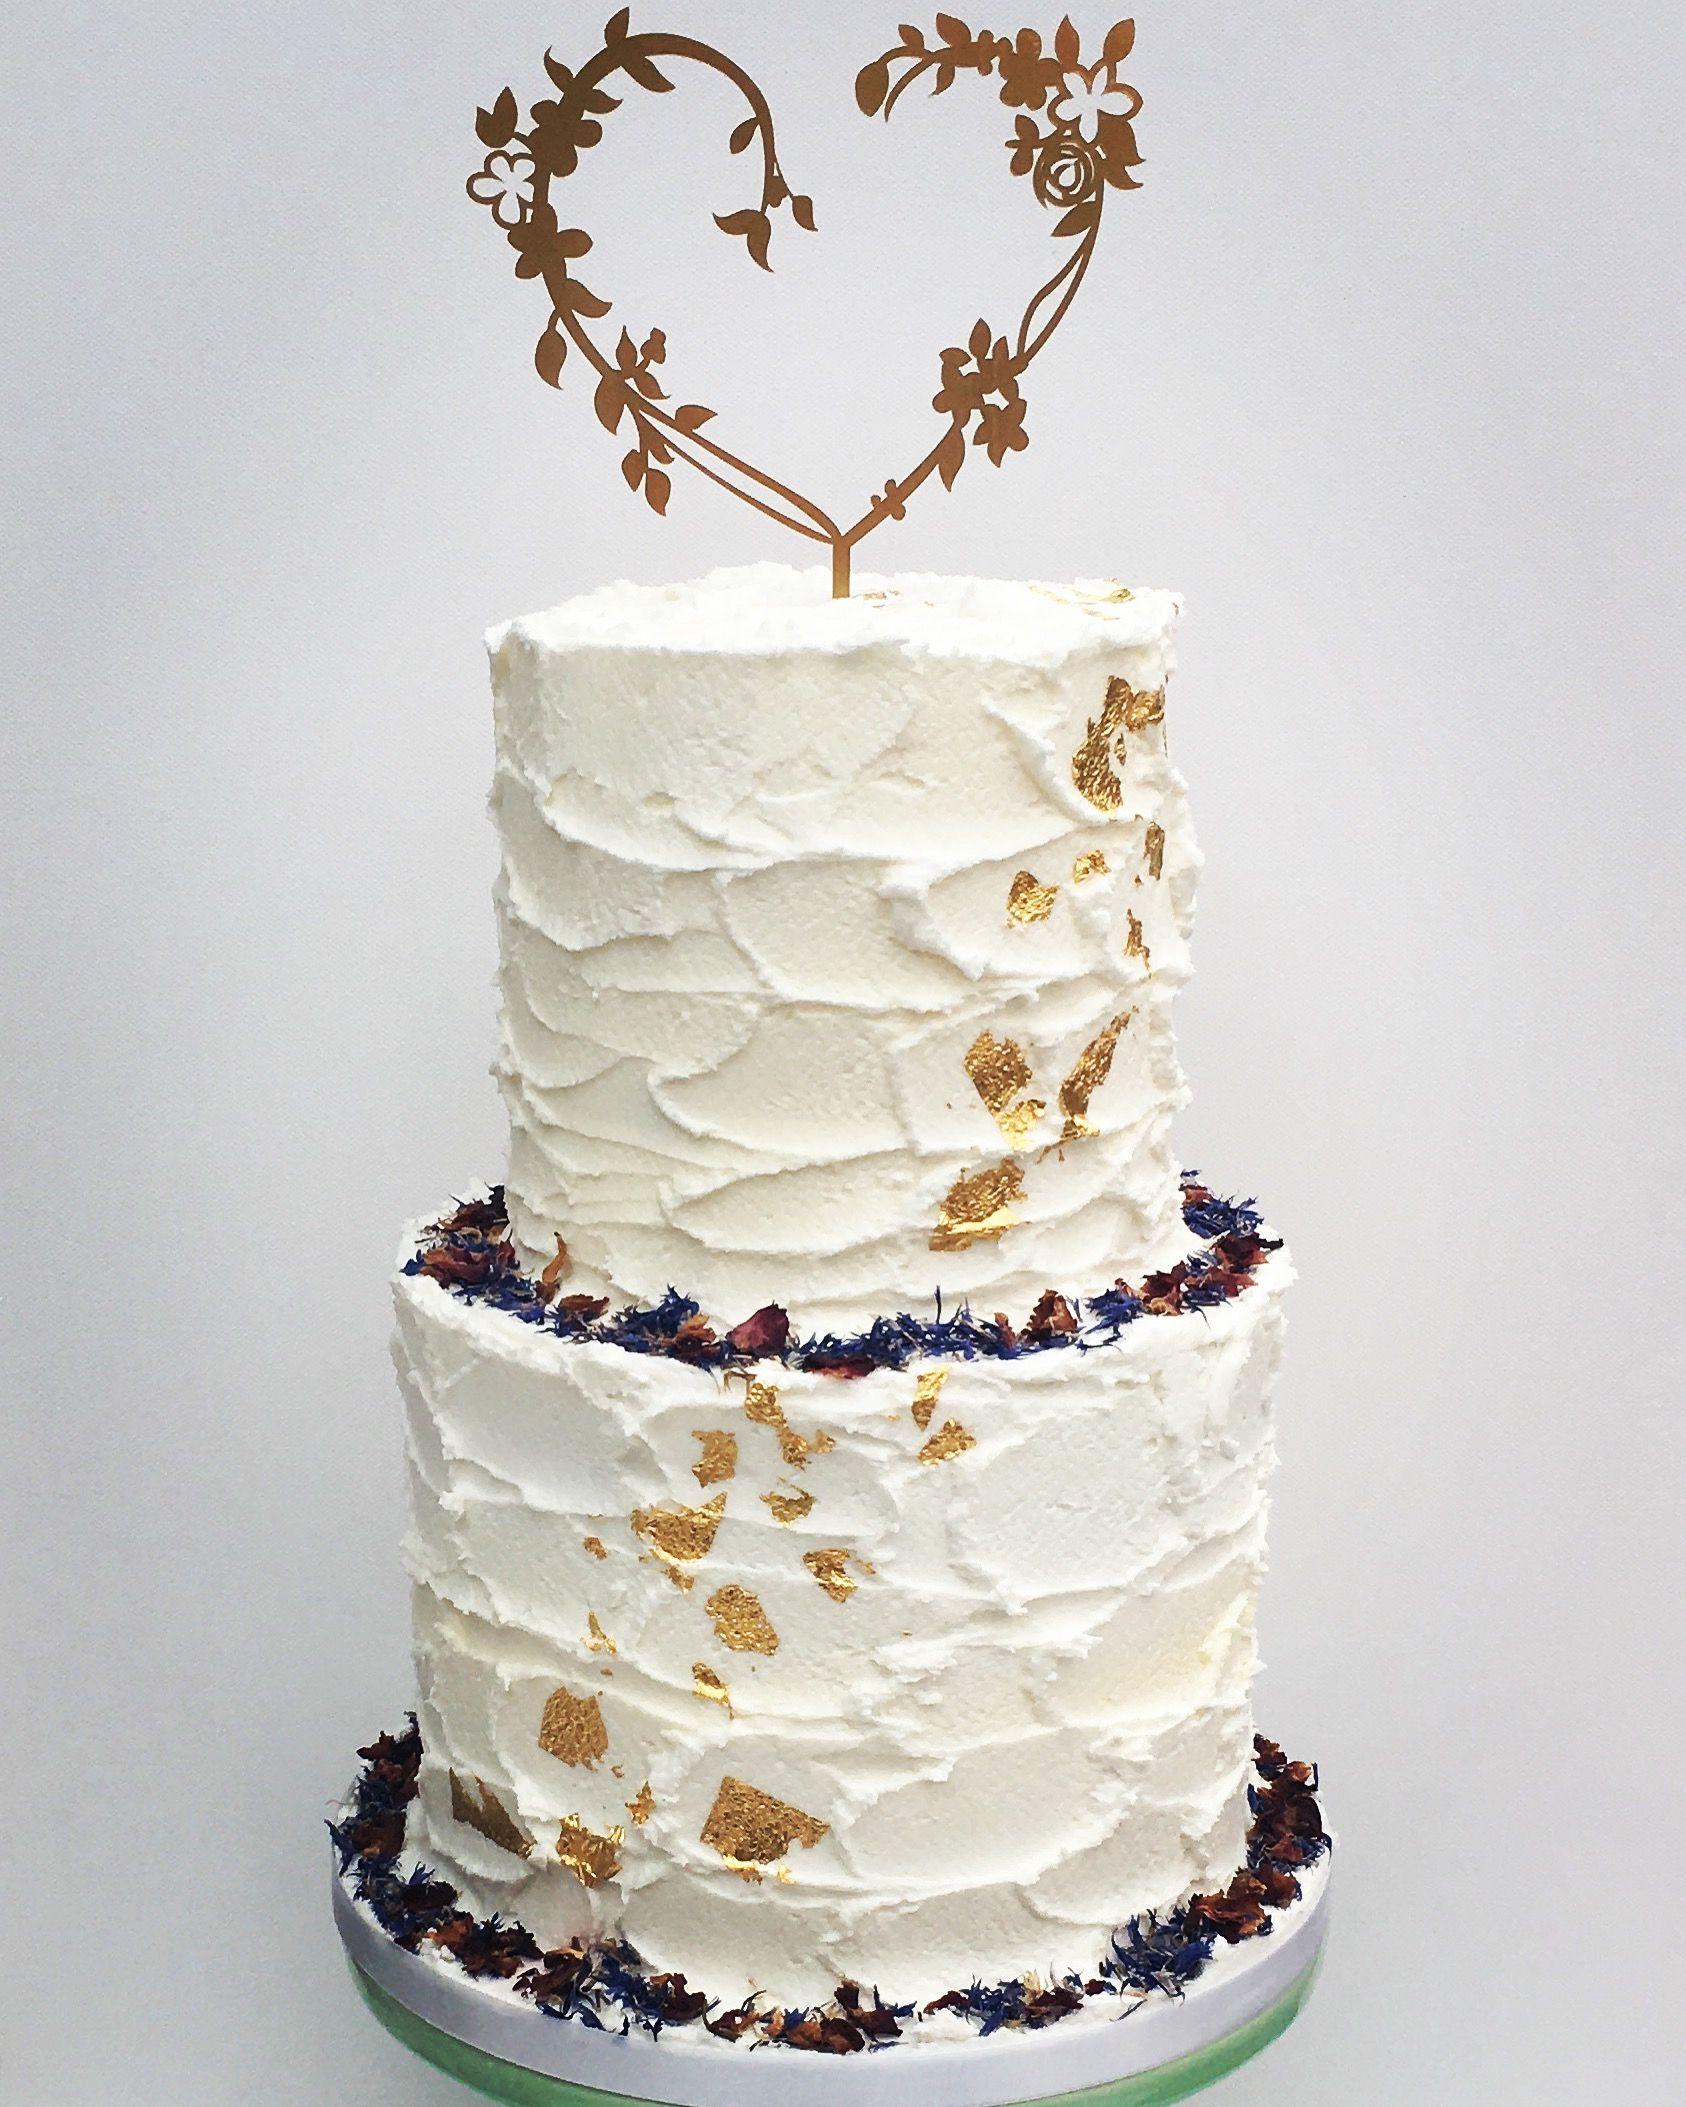 Rustic buttercream wedding cake gold leaf edible flowers cake topper ...